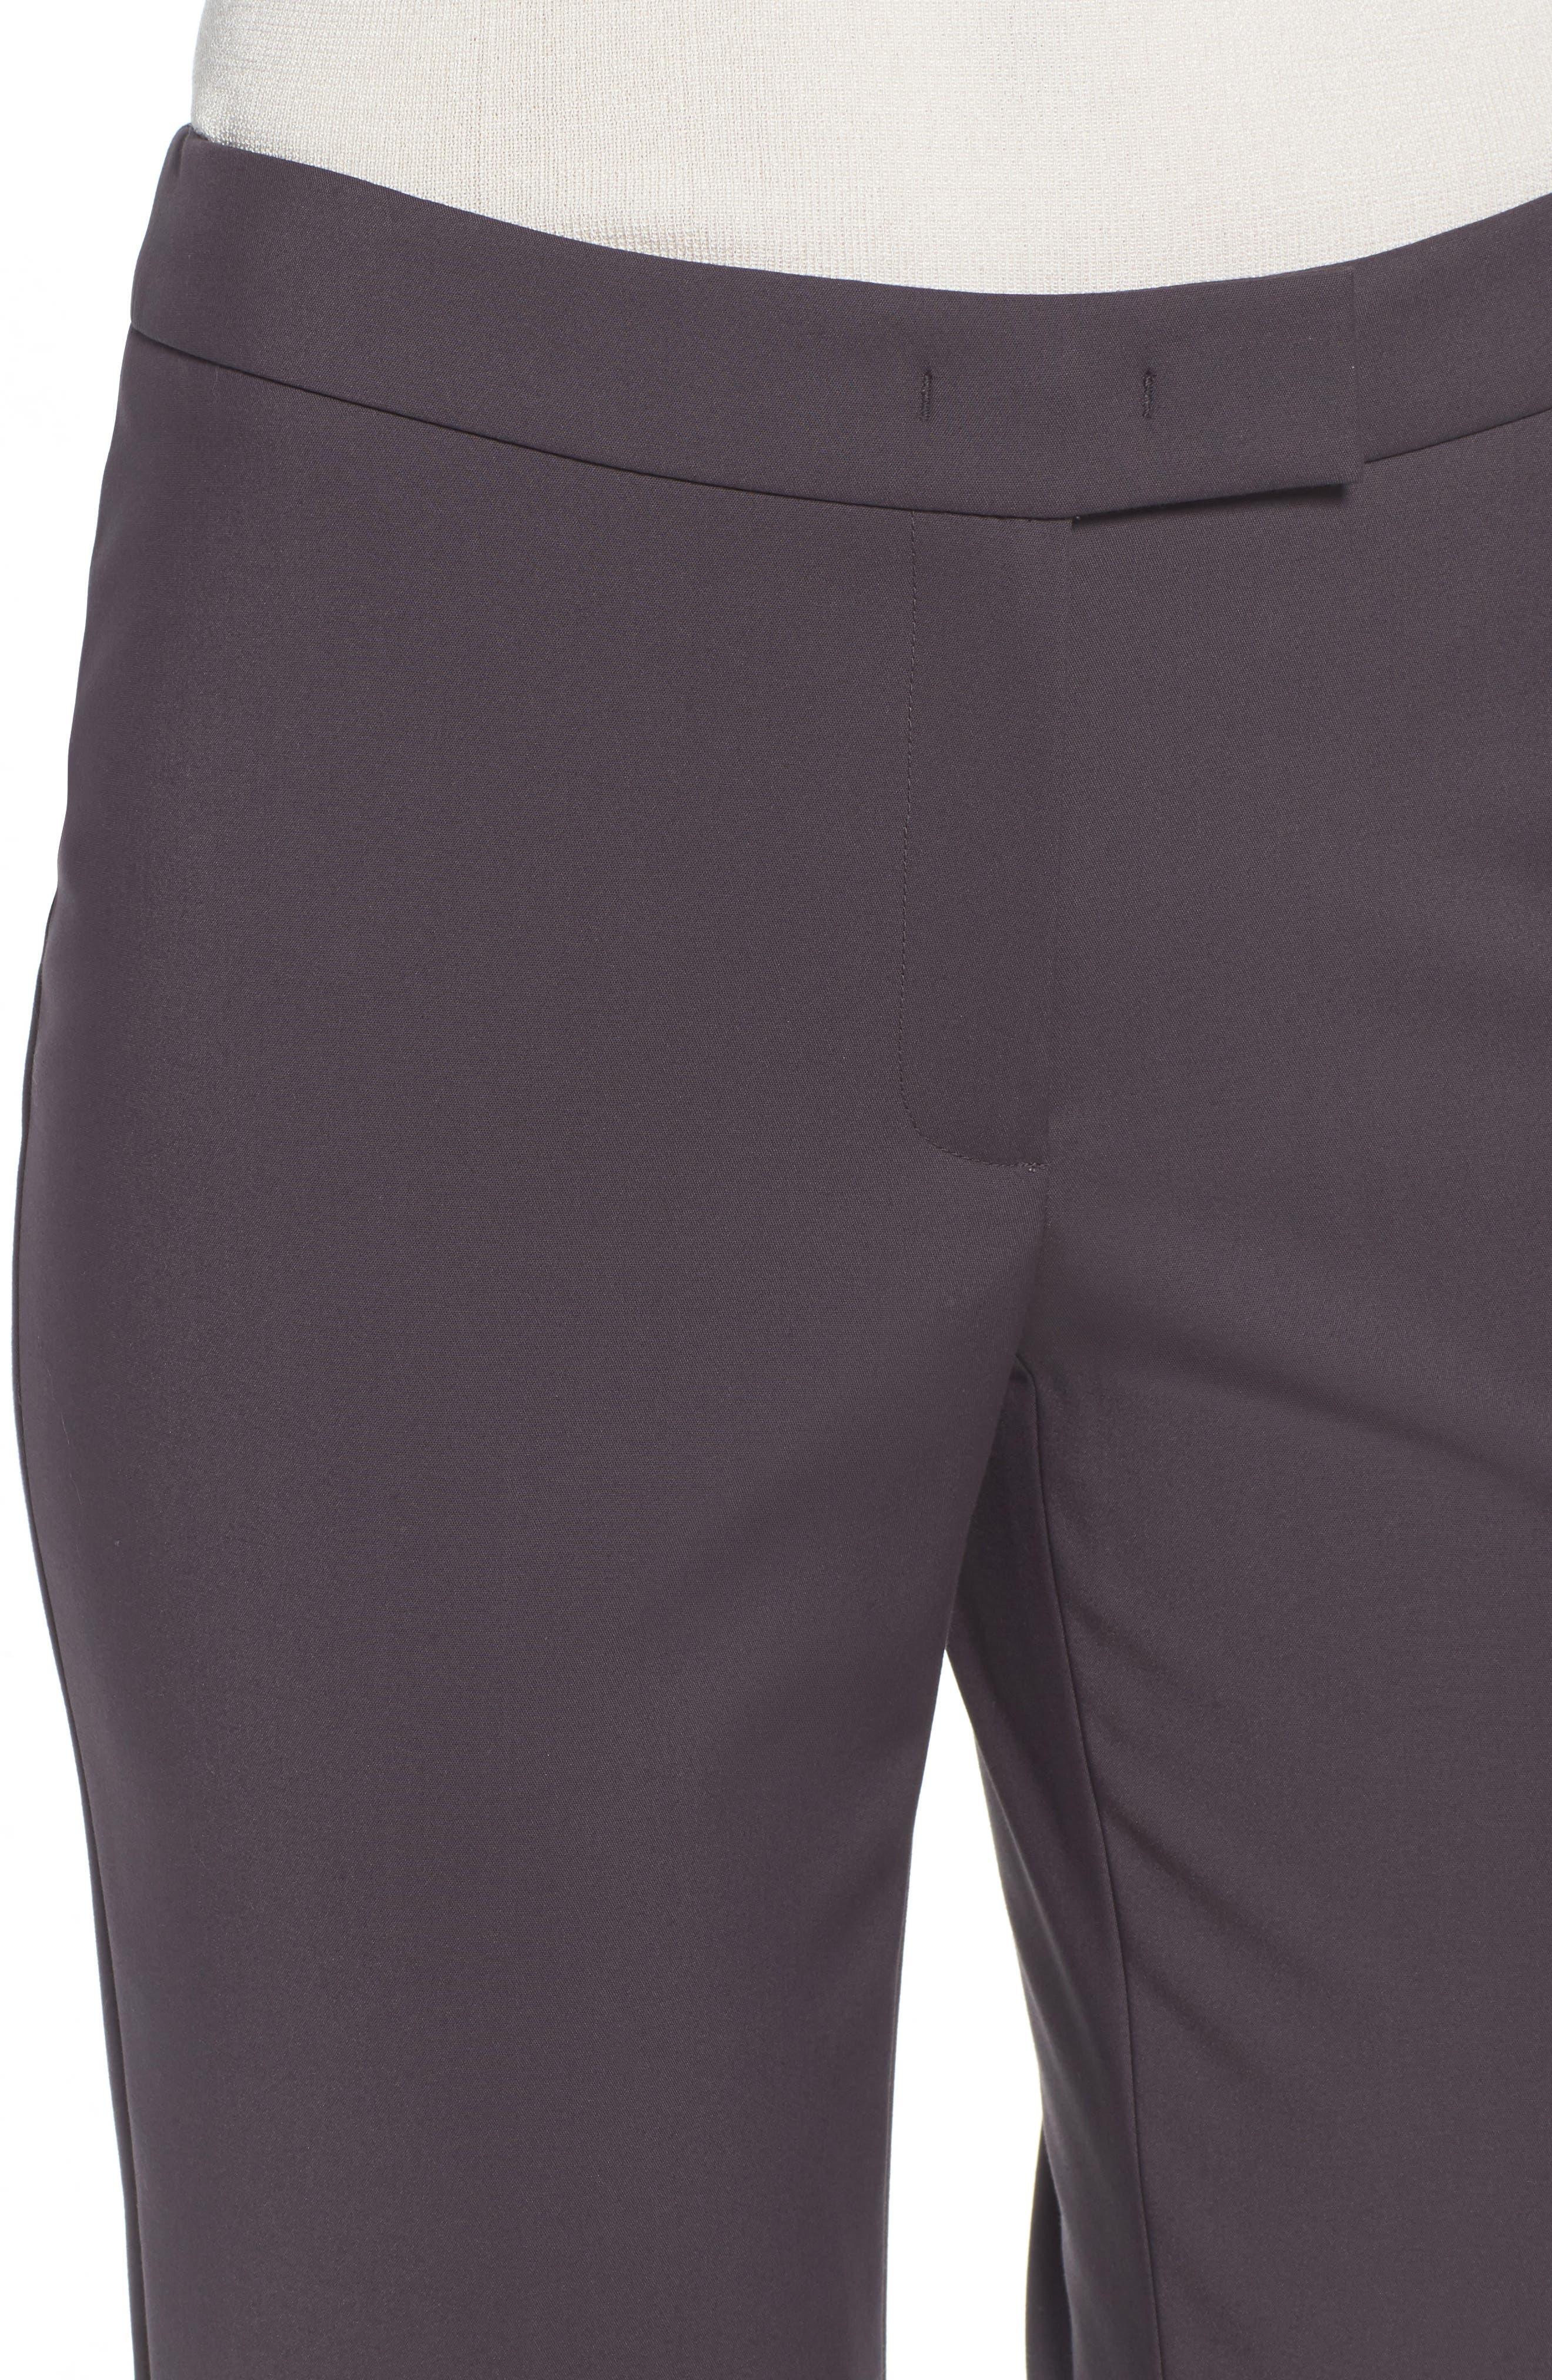 Slim Ankle Pants,                             Alternate thumbnail 4, color,                             Nantucket Grey